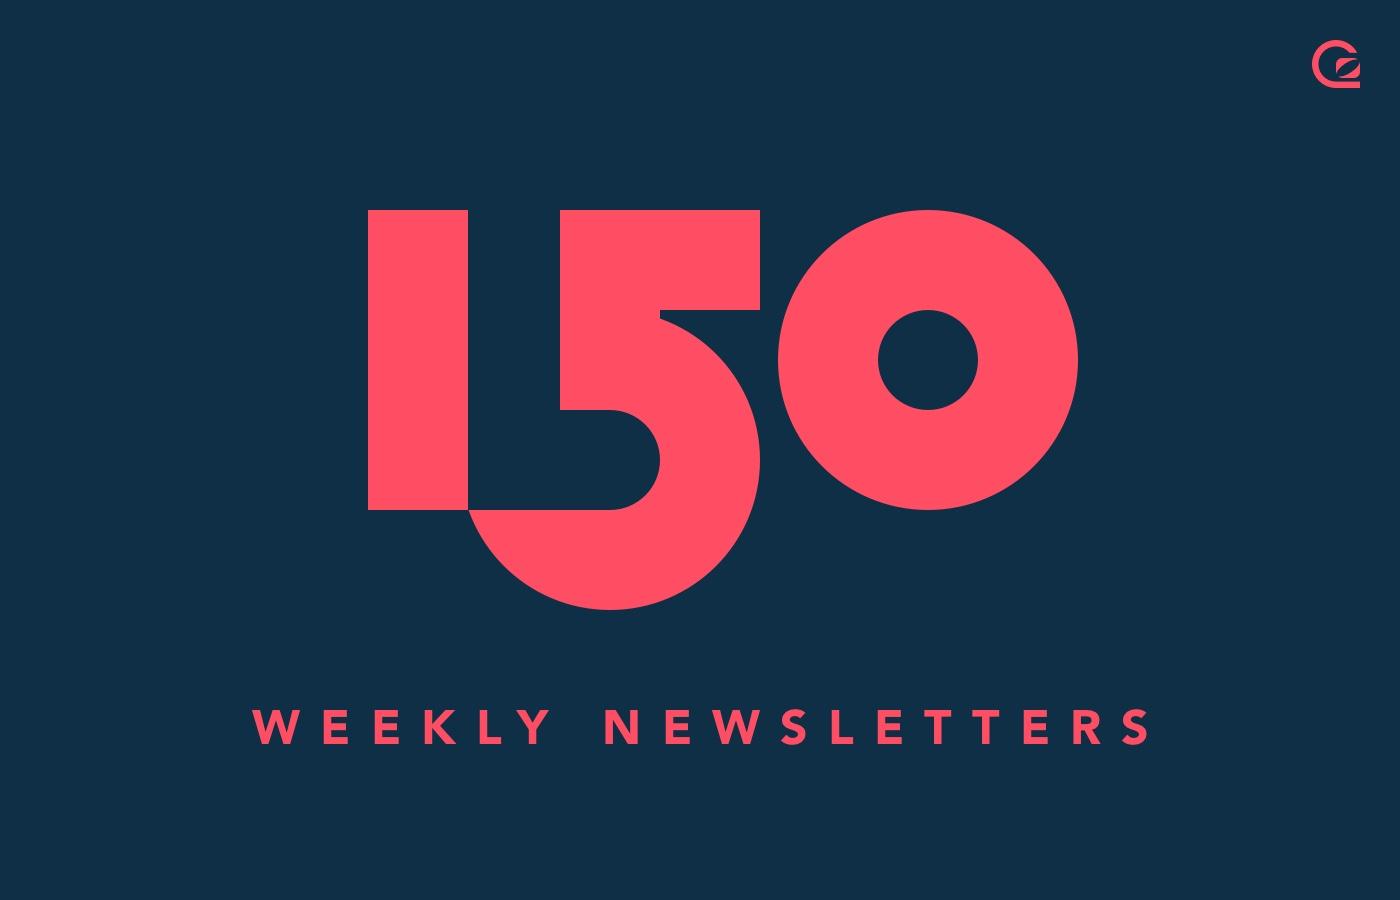 150 Weekly Newsletters